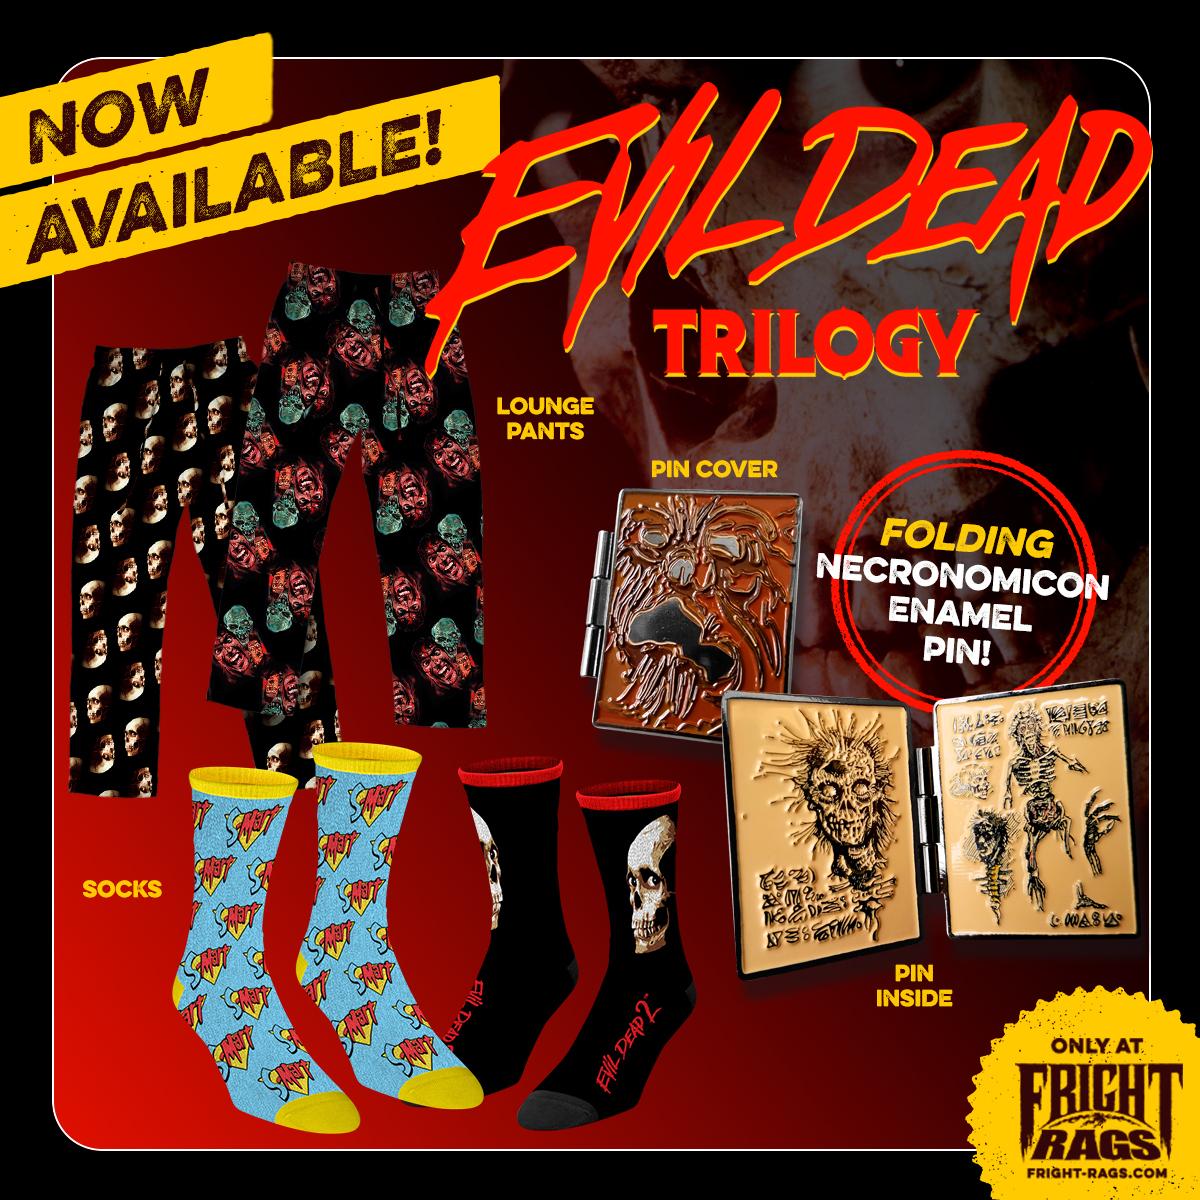 Fright-Rags Debuts Exclusive EVIL DEAD Merchandise!